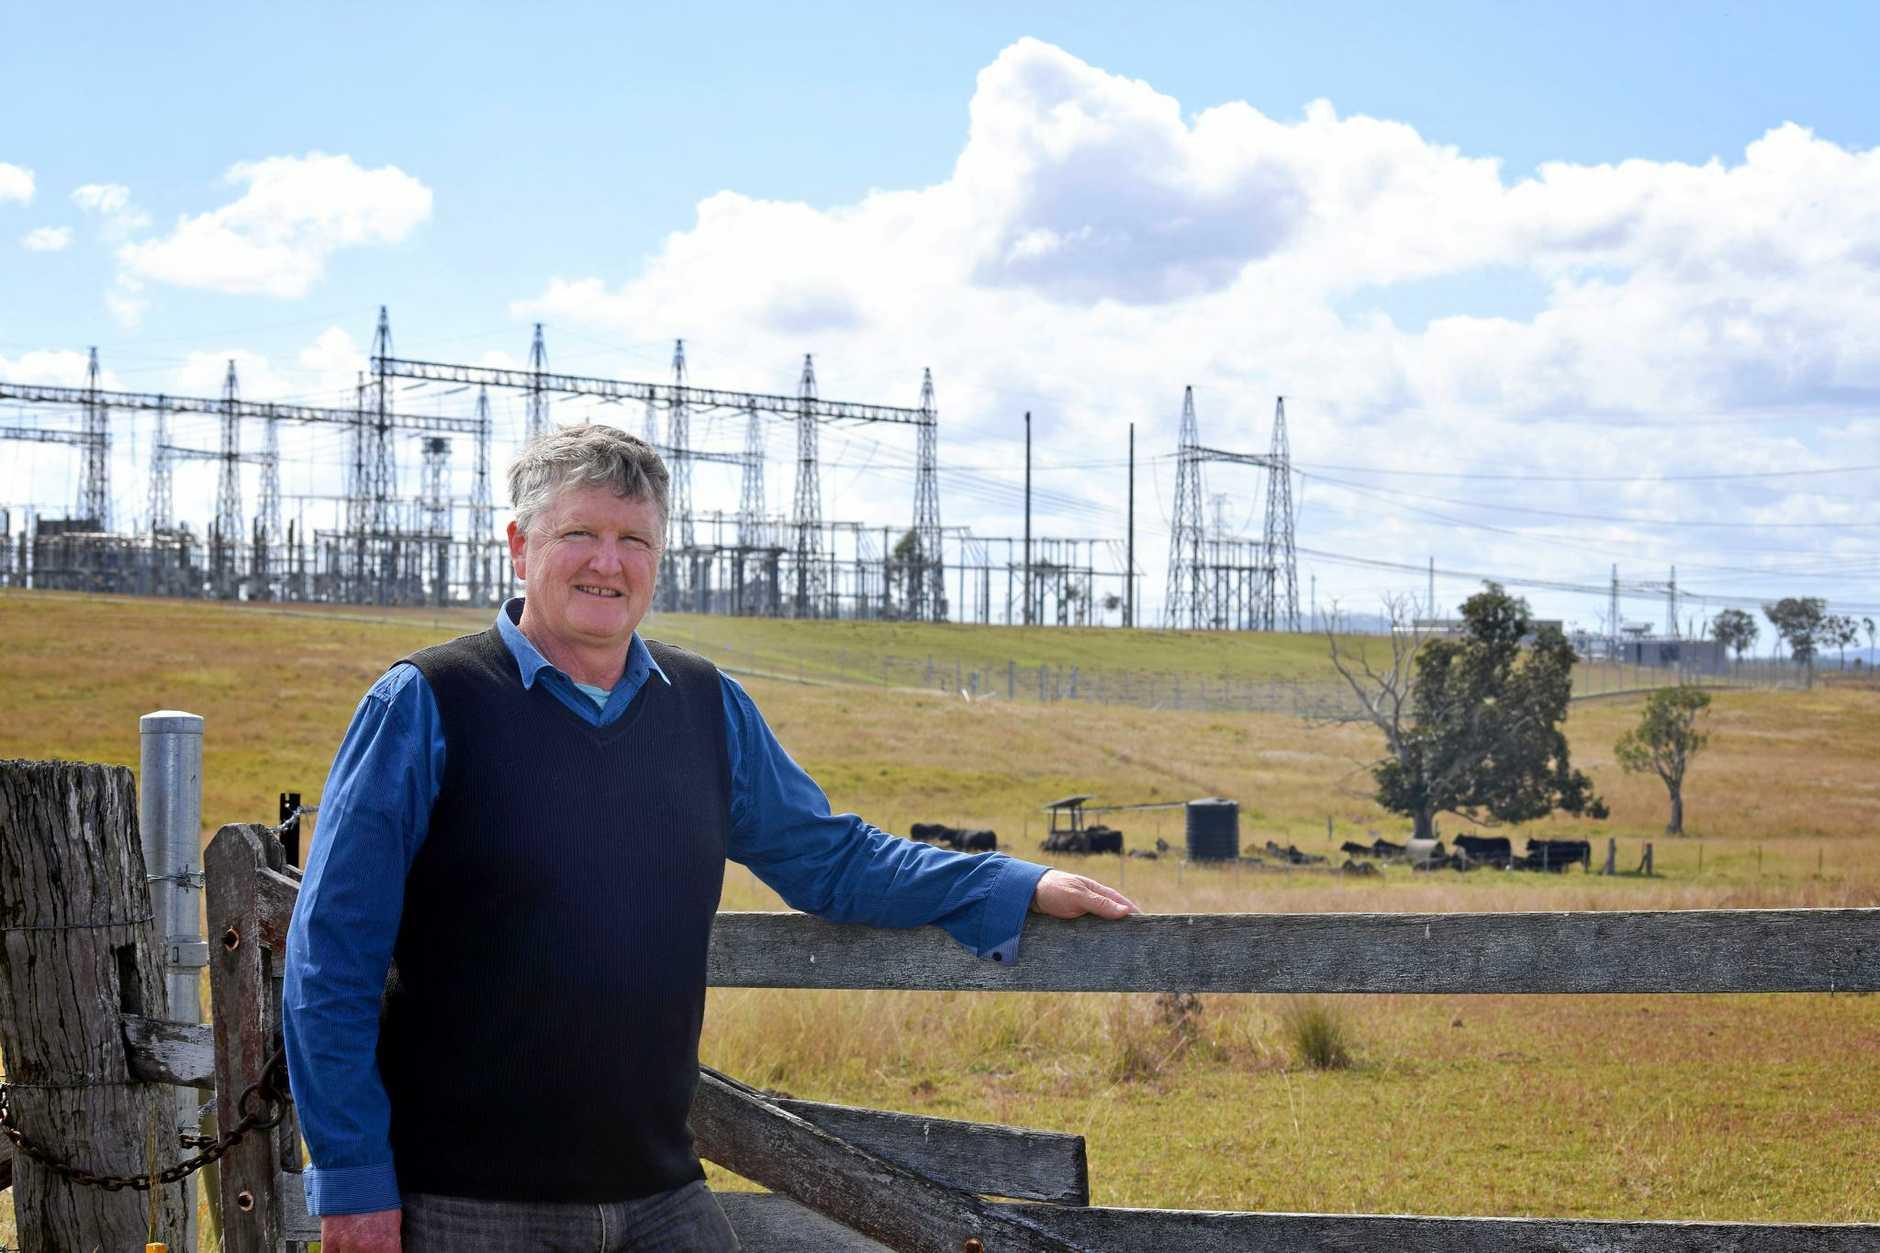 POWERING UP: Scott Armstrong is seeking public feedback on his $2 billion Lower Wonga solar farm proposal.